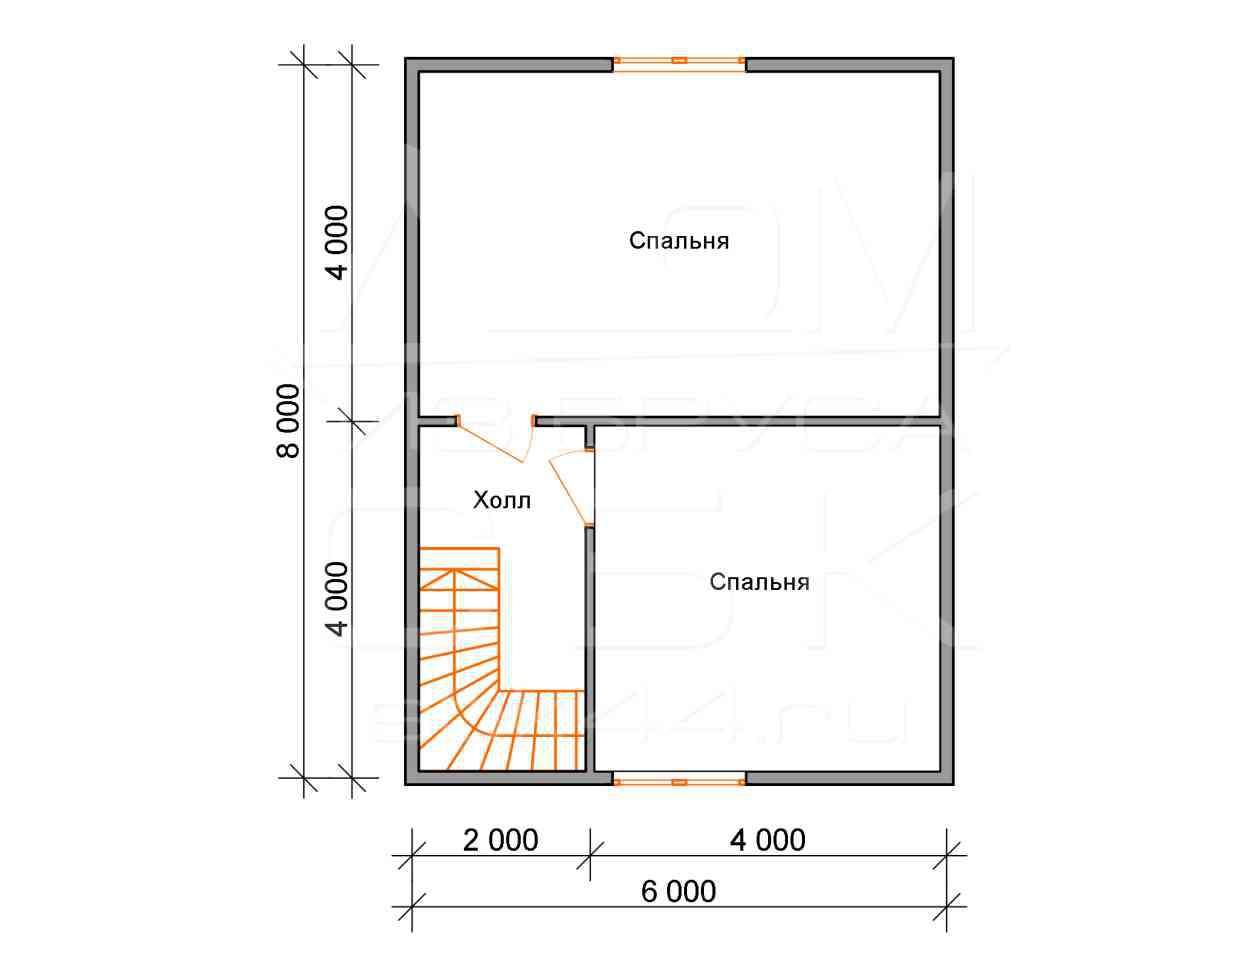 Проект дома из бруса 6 х 8 м «Борисово» - план 2 этаж